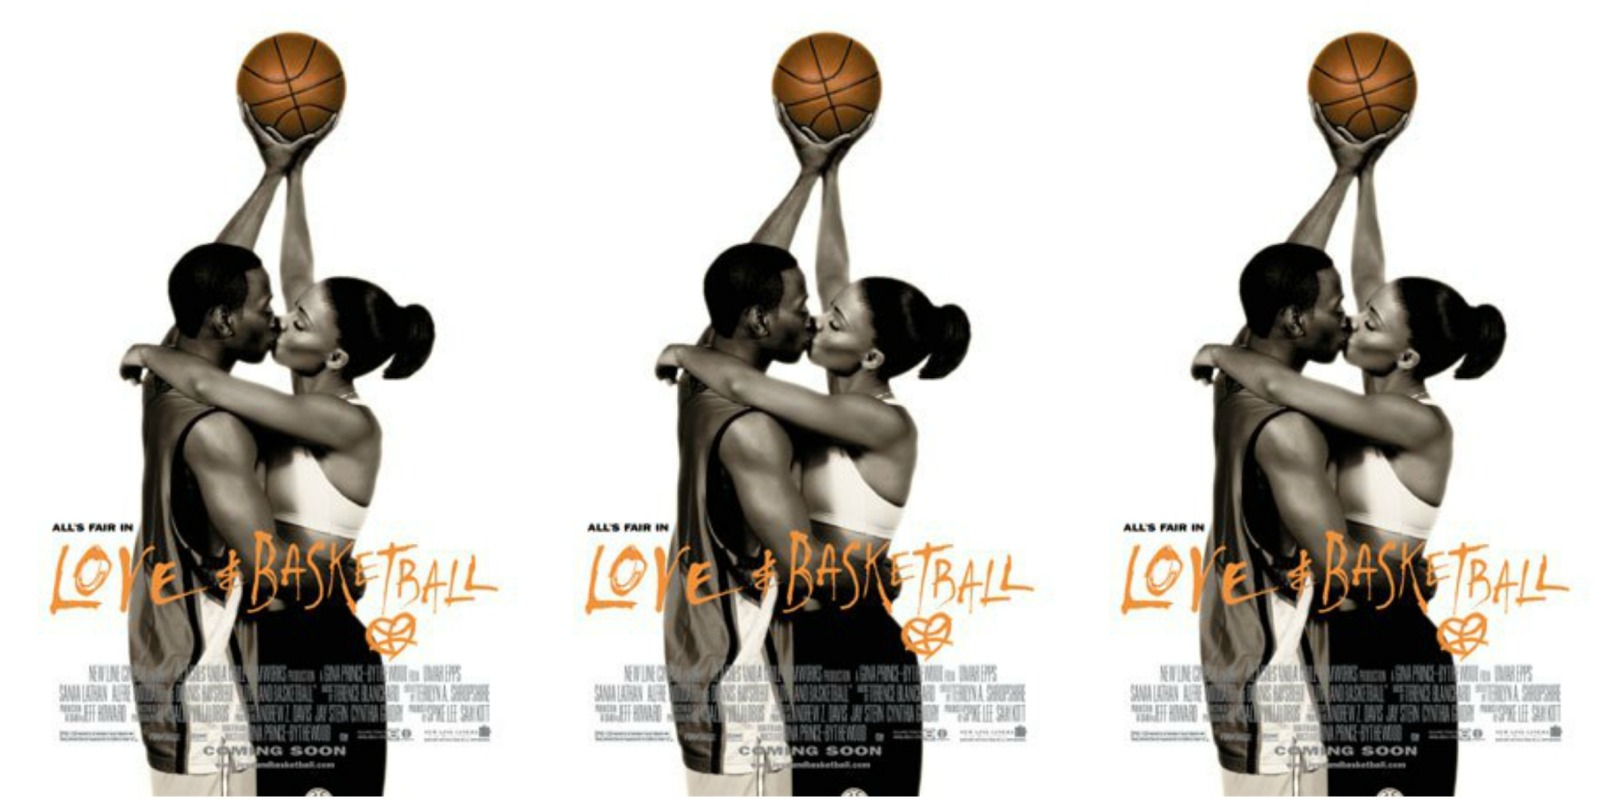 Love and Basektball movie poster